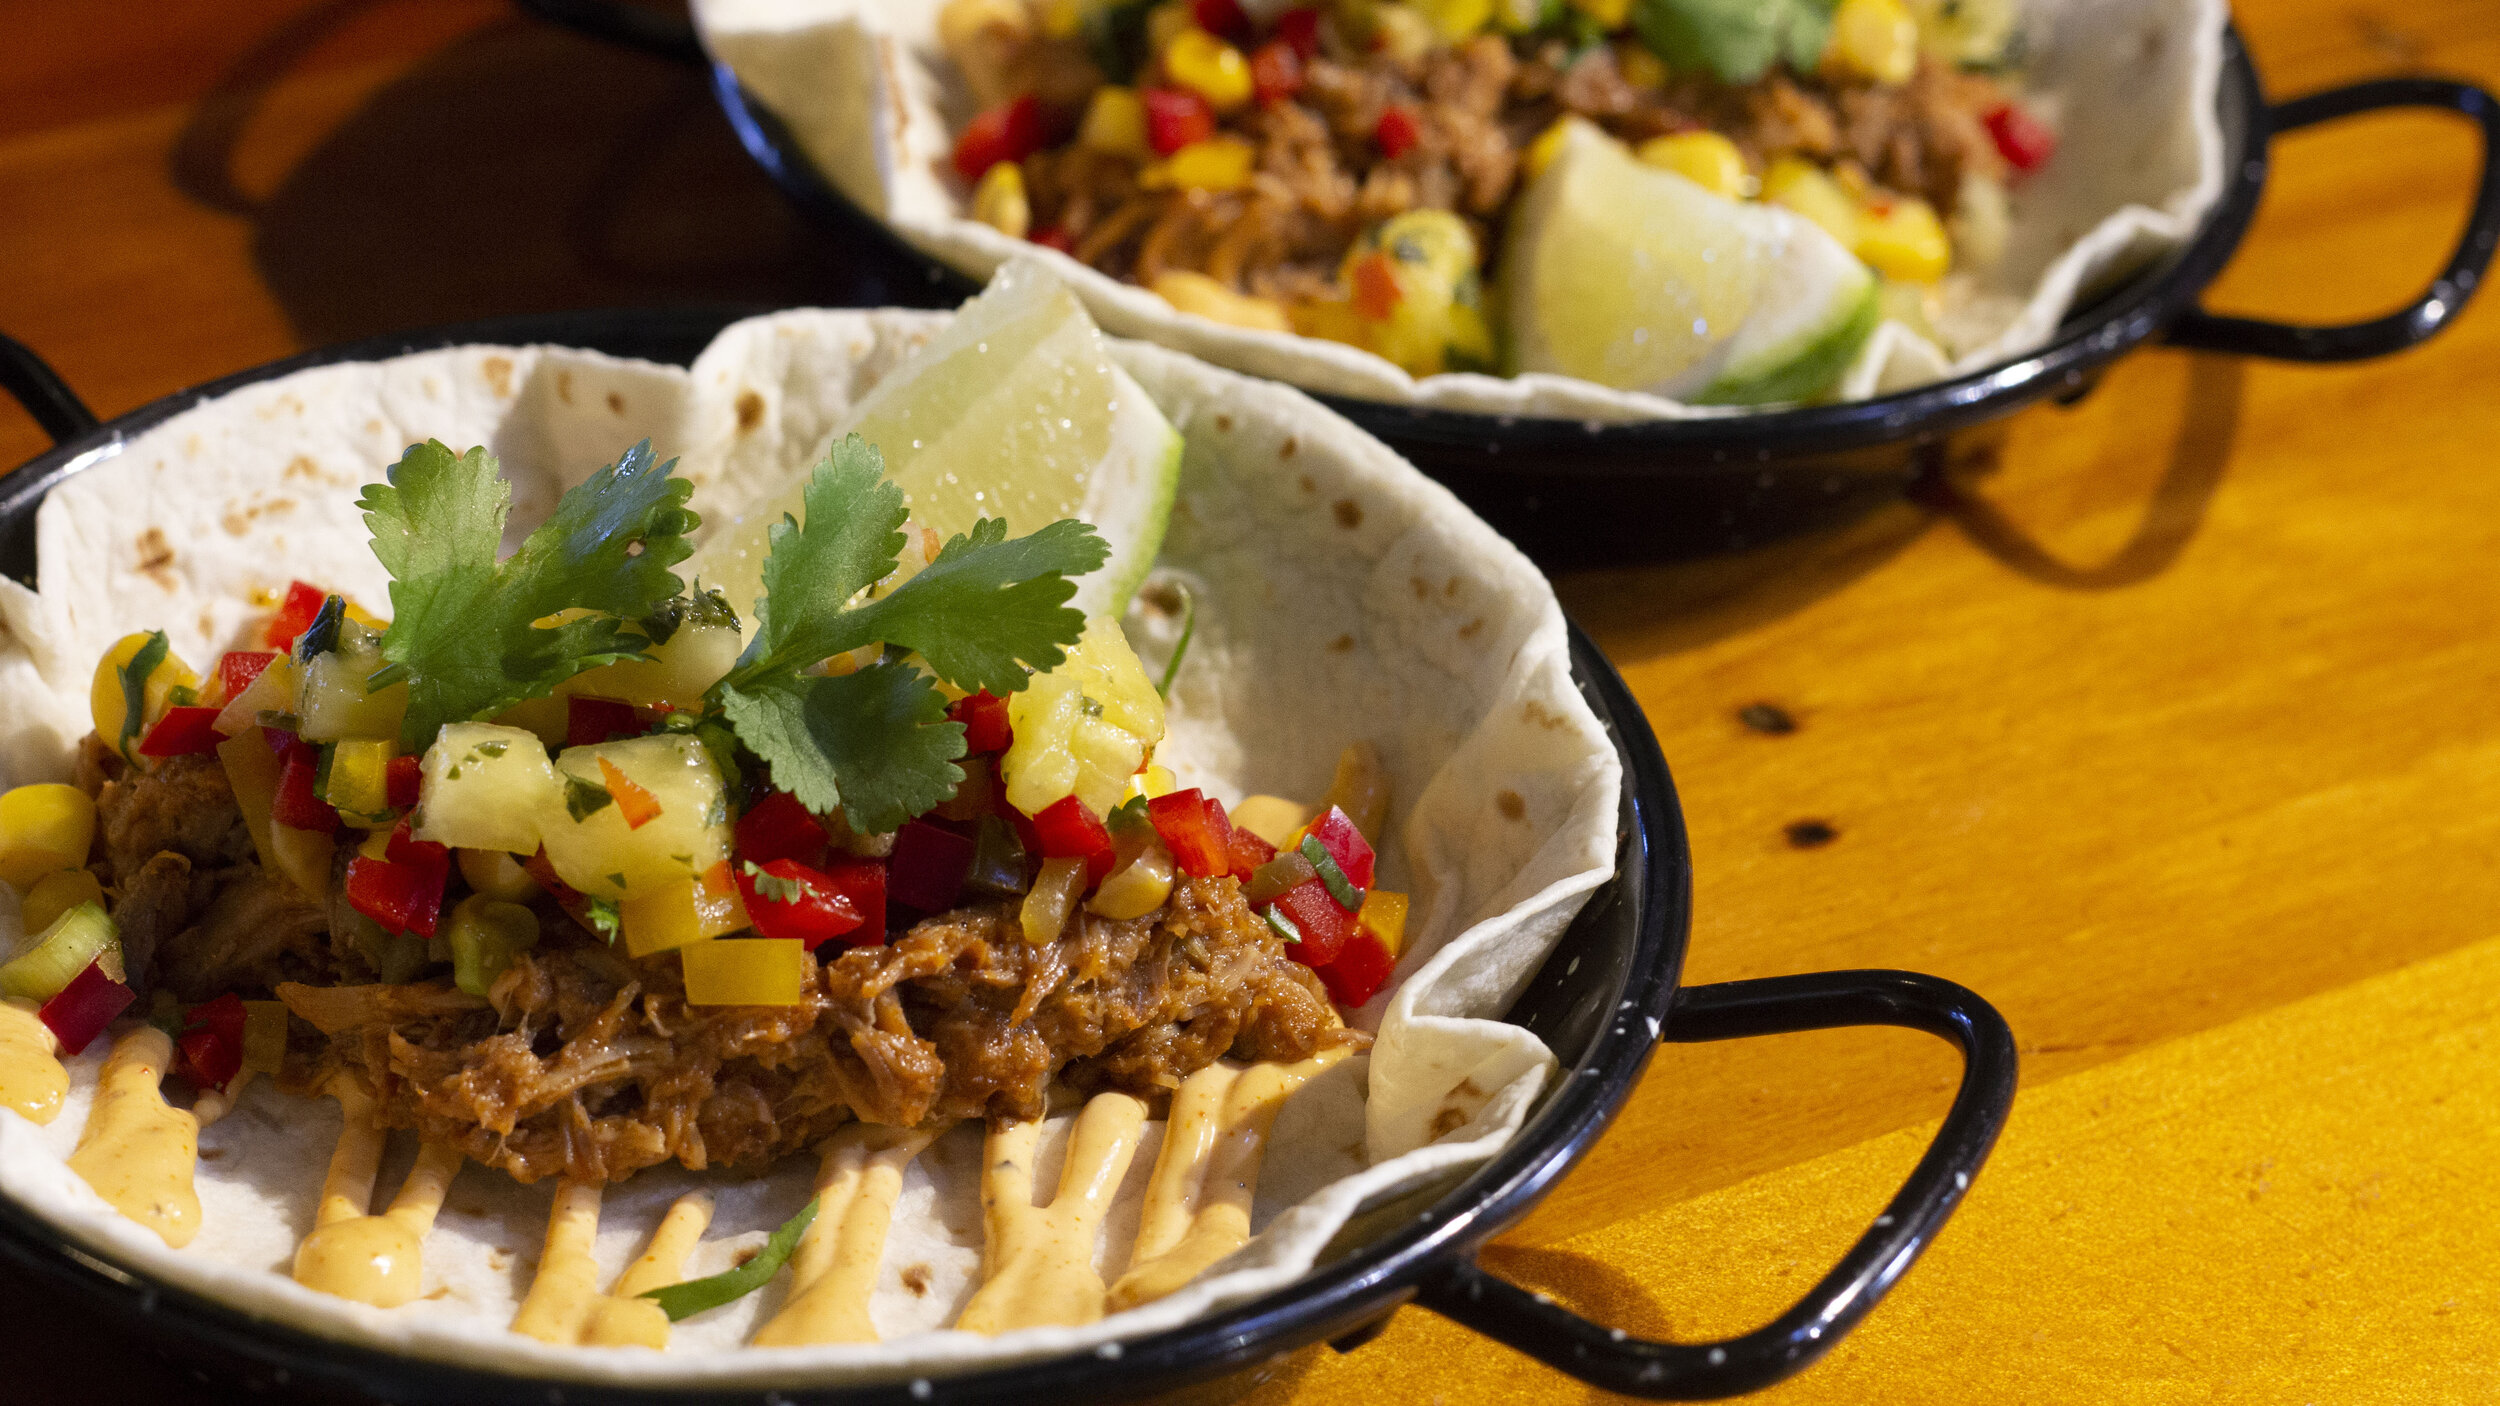 Jamaican Jerk Pulled Pork Taco